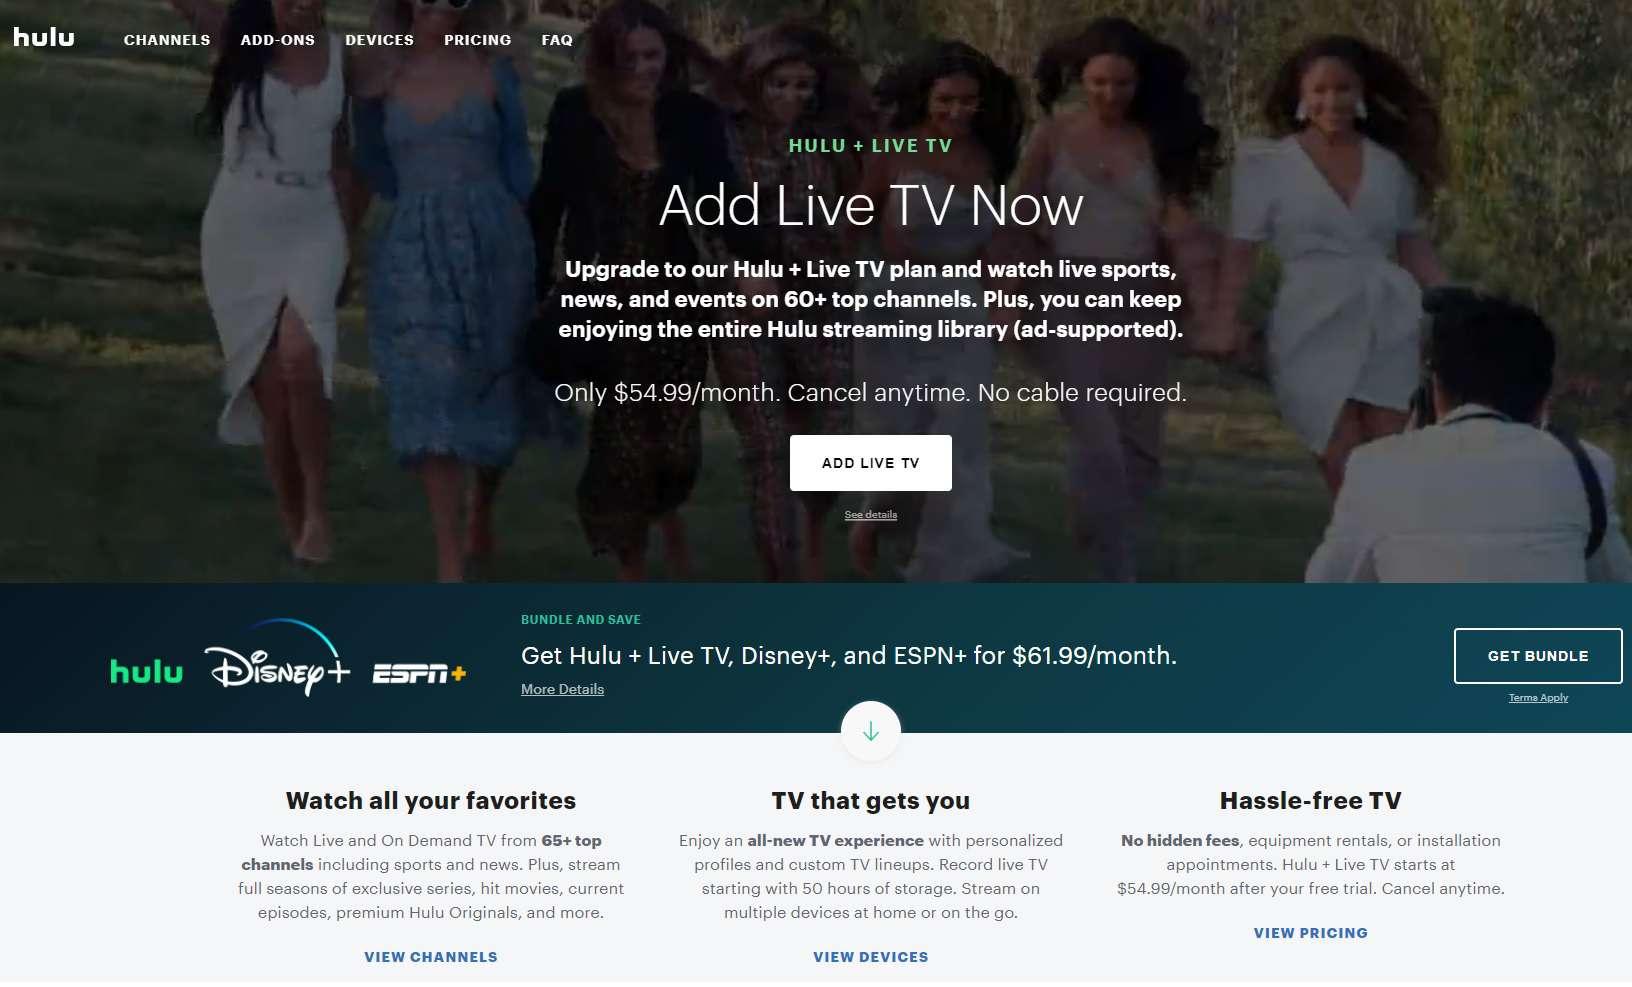 Hulu's Live TV service homepage